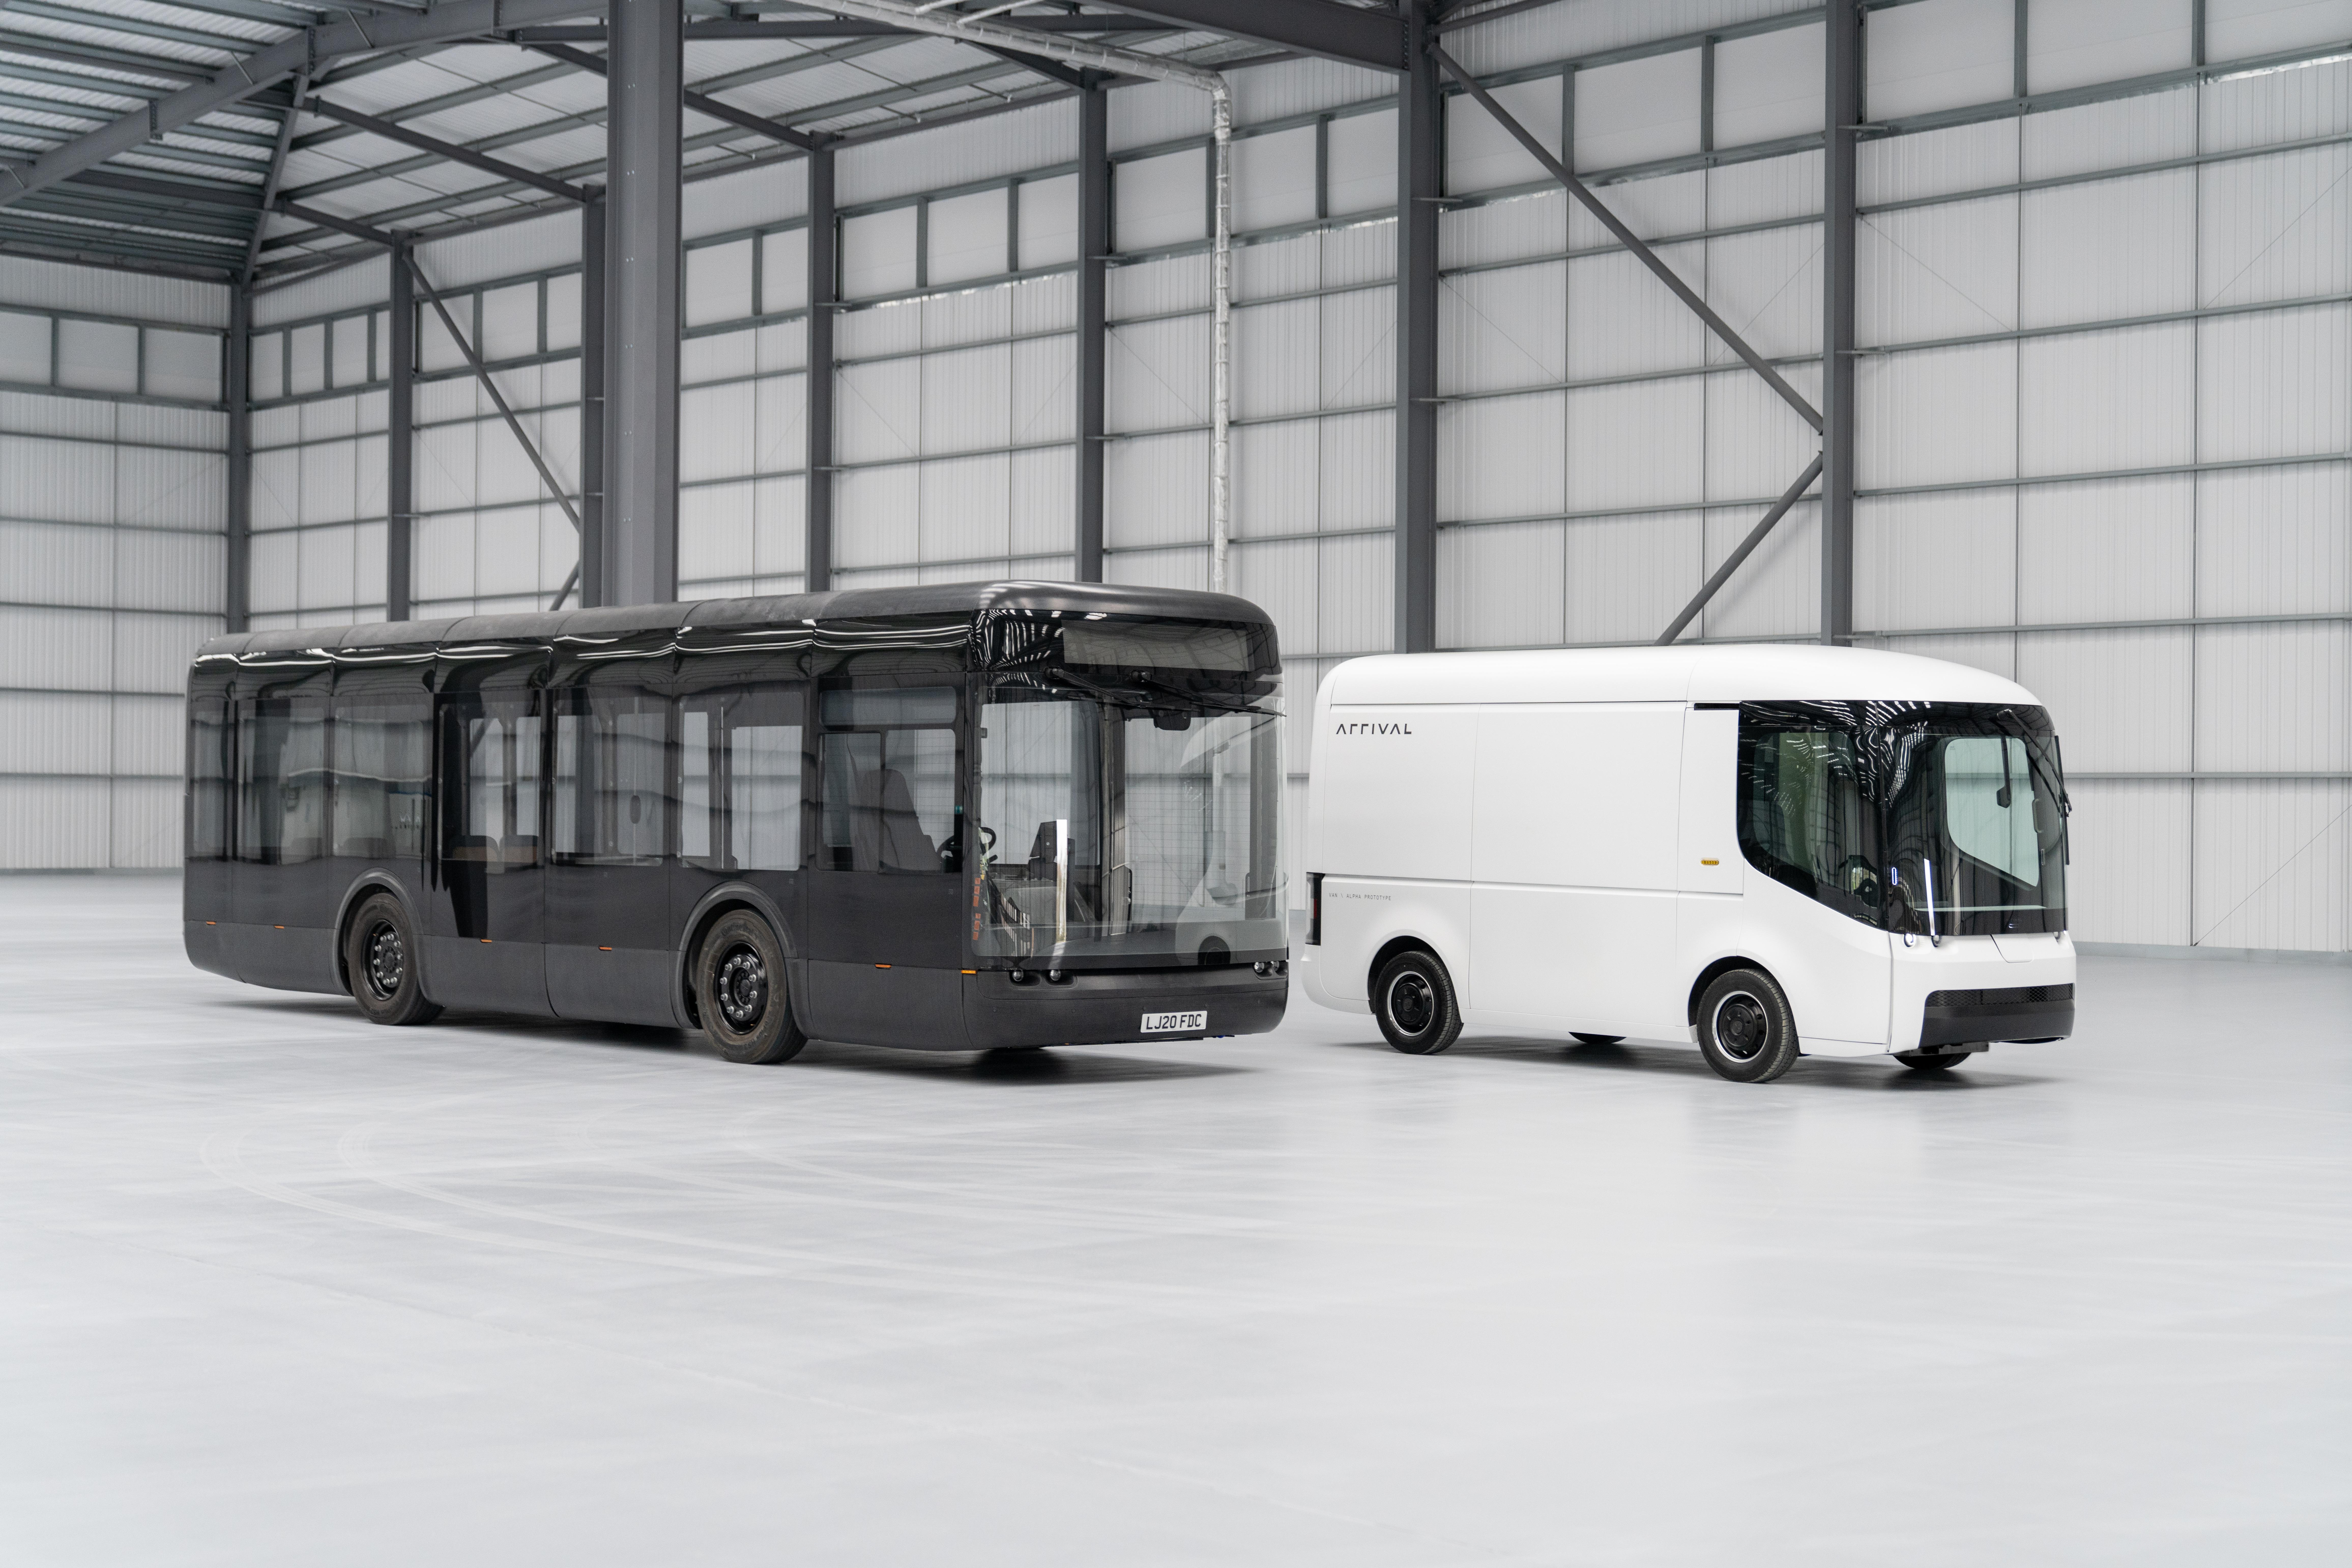 Arrival electric bus van